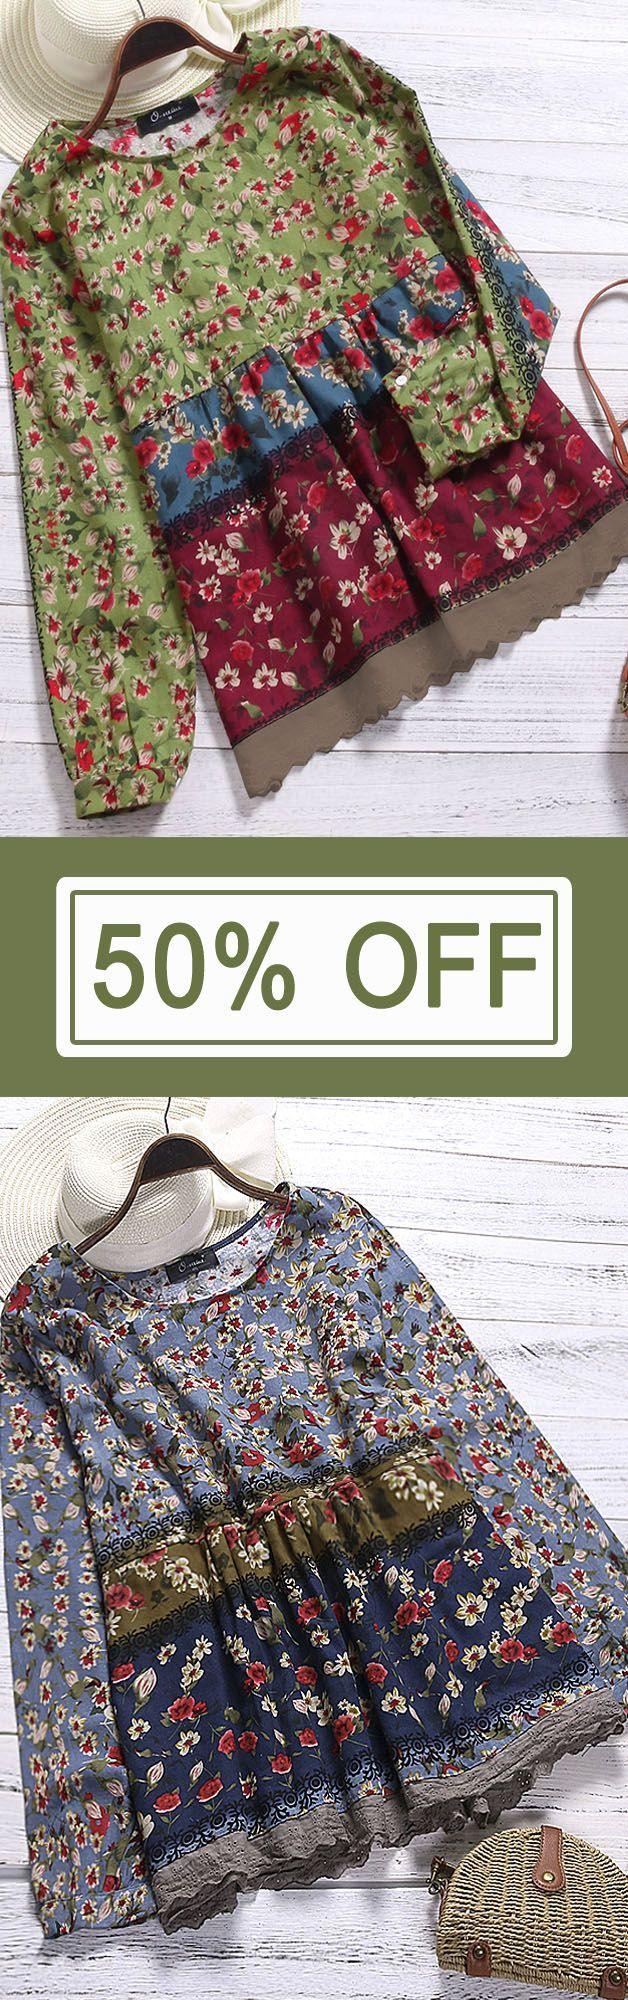 Vintage Women Floral Printed Patchwork Shirt. Vintage Style, Loose Style, Long Sleeve, O-Neck. Color:Blue,Green,Wine Red. Size:S,M,L,XL,XXL,XXXL,XXXXL,5XL. Buy now!  #women #blouse #fashion